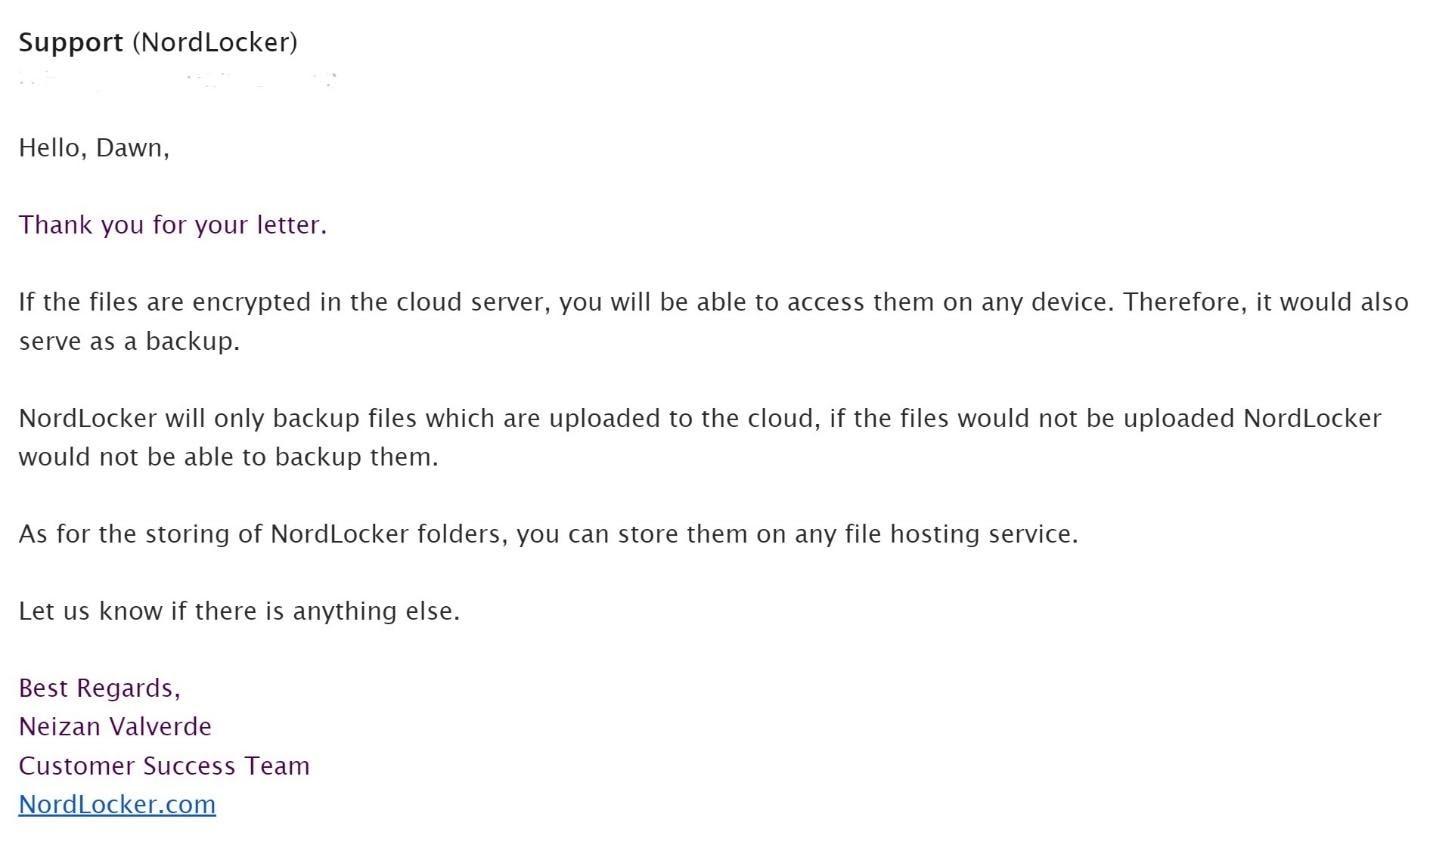 NordLocker email support was helpful